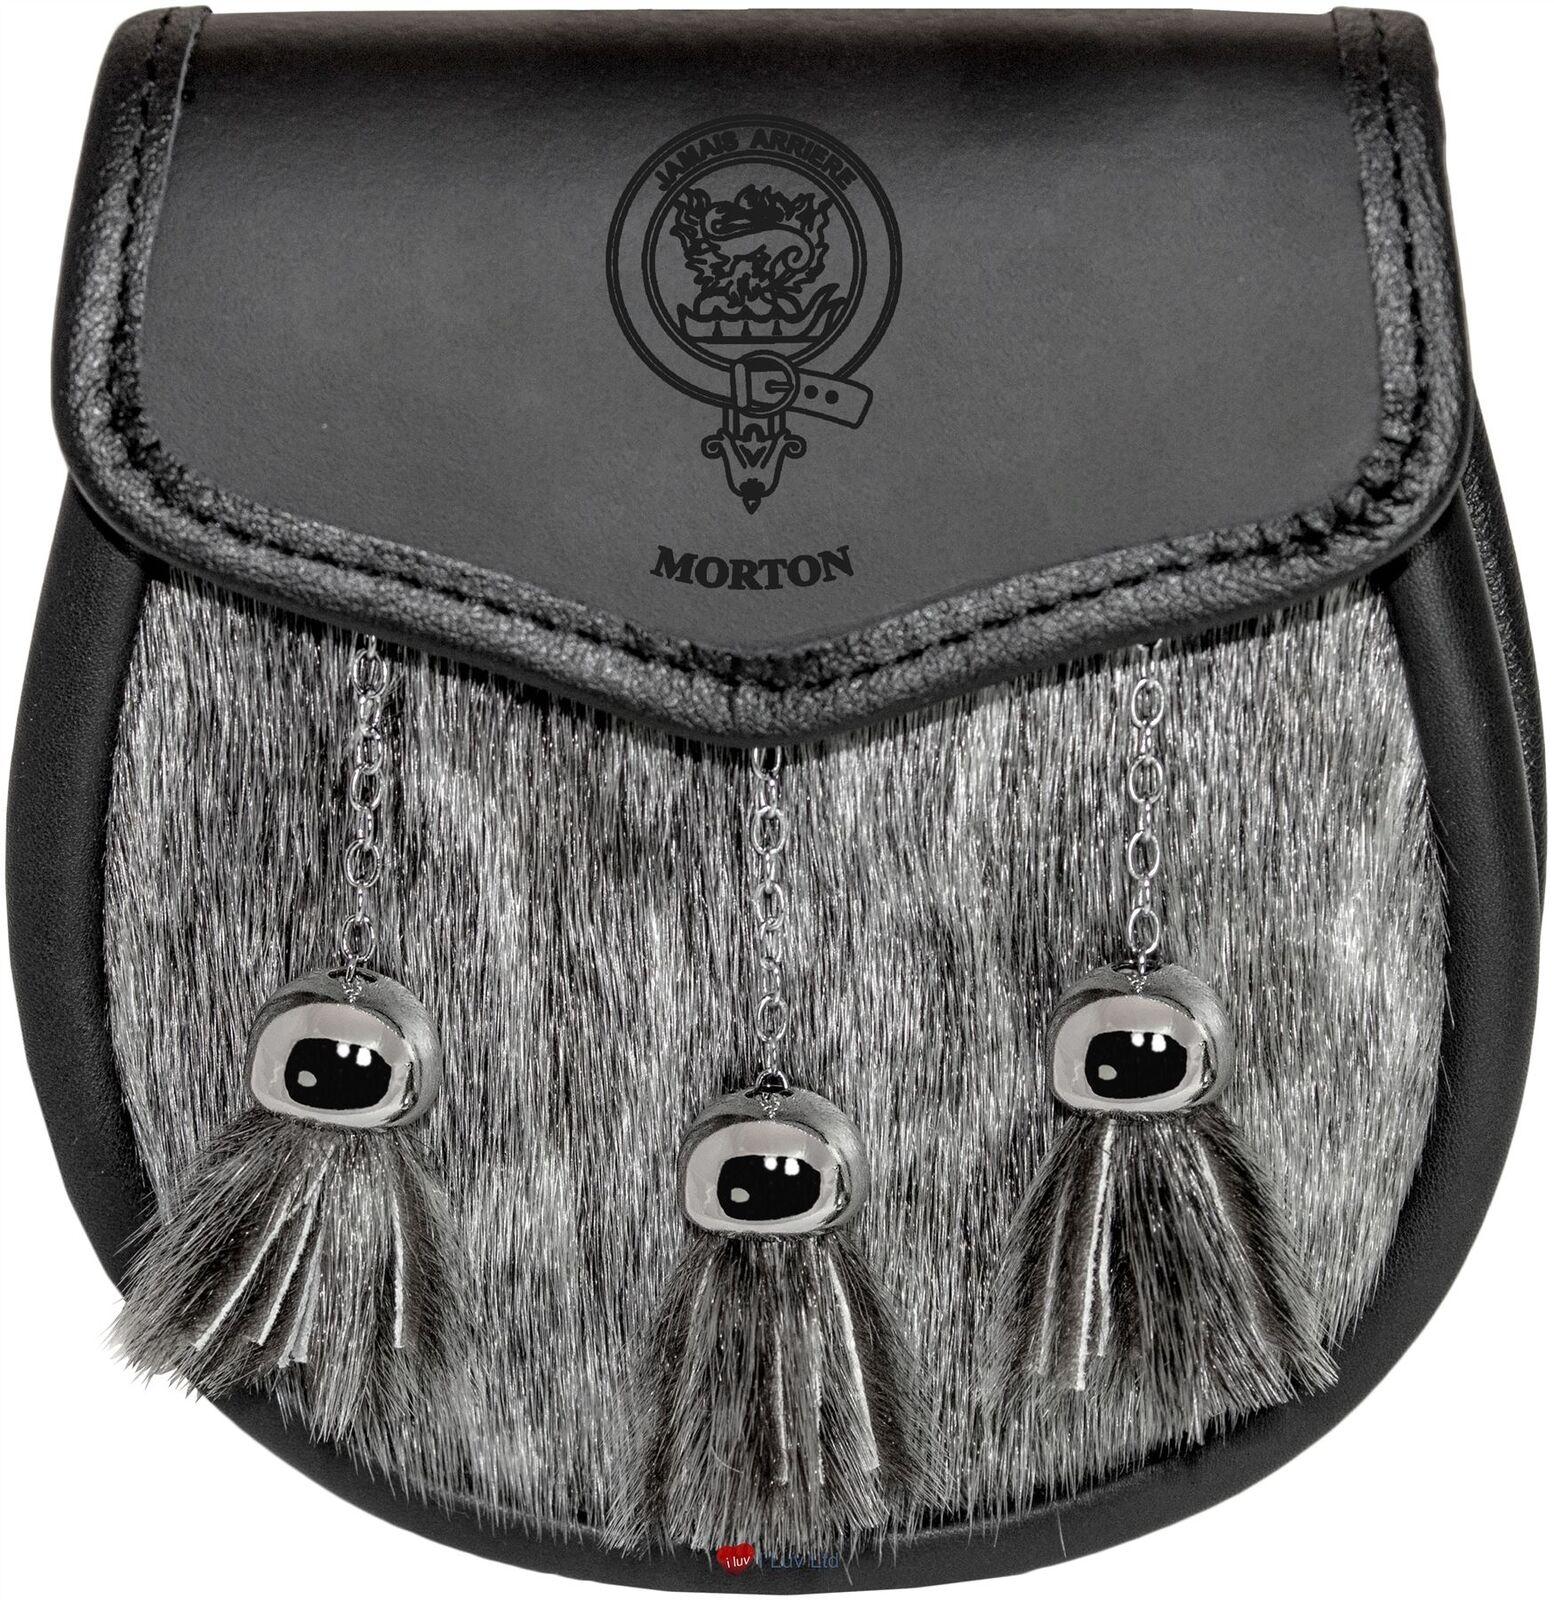 Morton Semi Dress Sporran Fur Plain Leather Flap Scottish Clan Crest